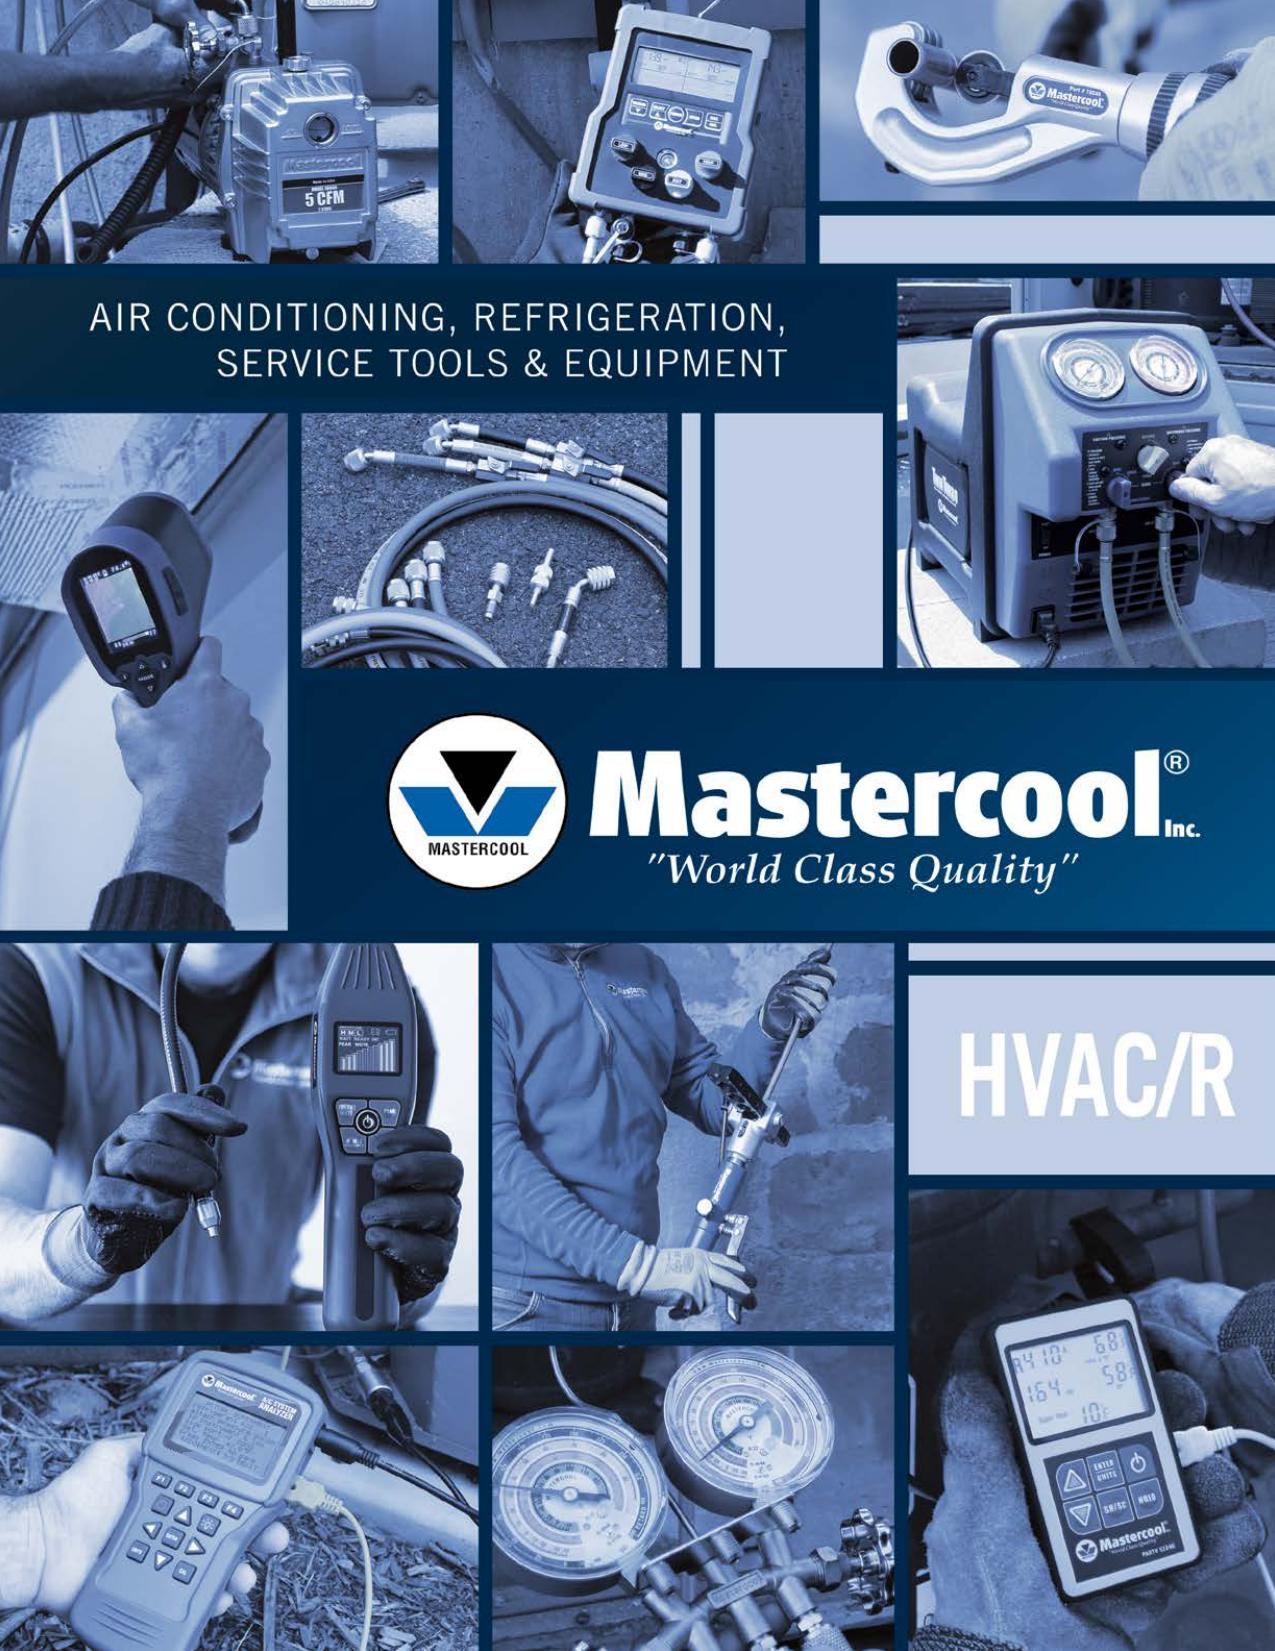 Mastercool 58203 2-Way Ball Valve Manifold w//3//8 Bore /& 3 1//8 gauge